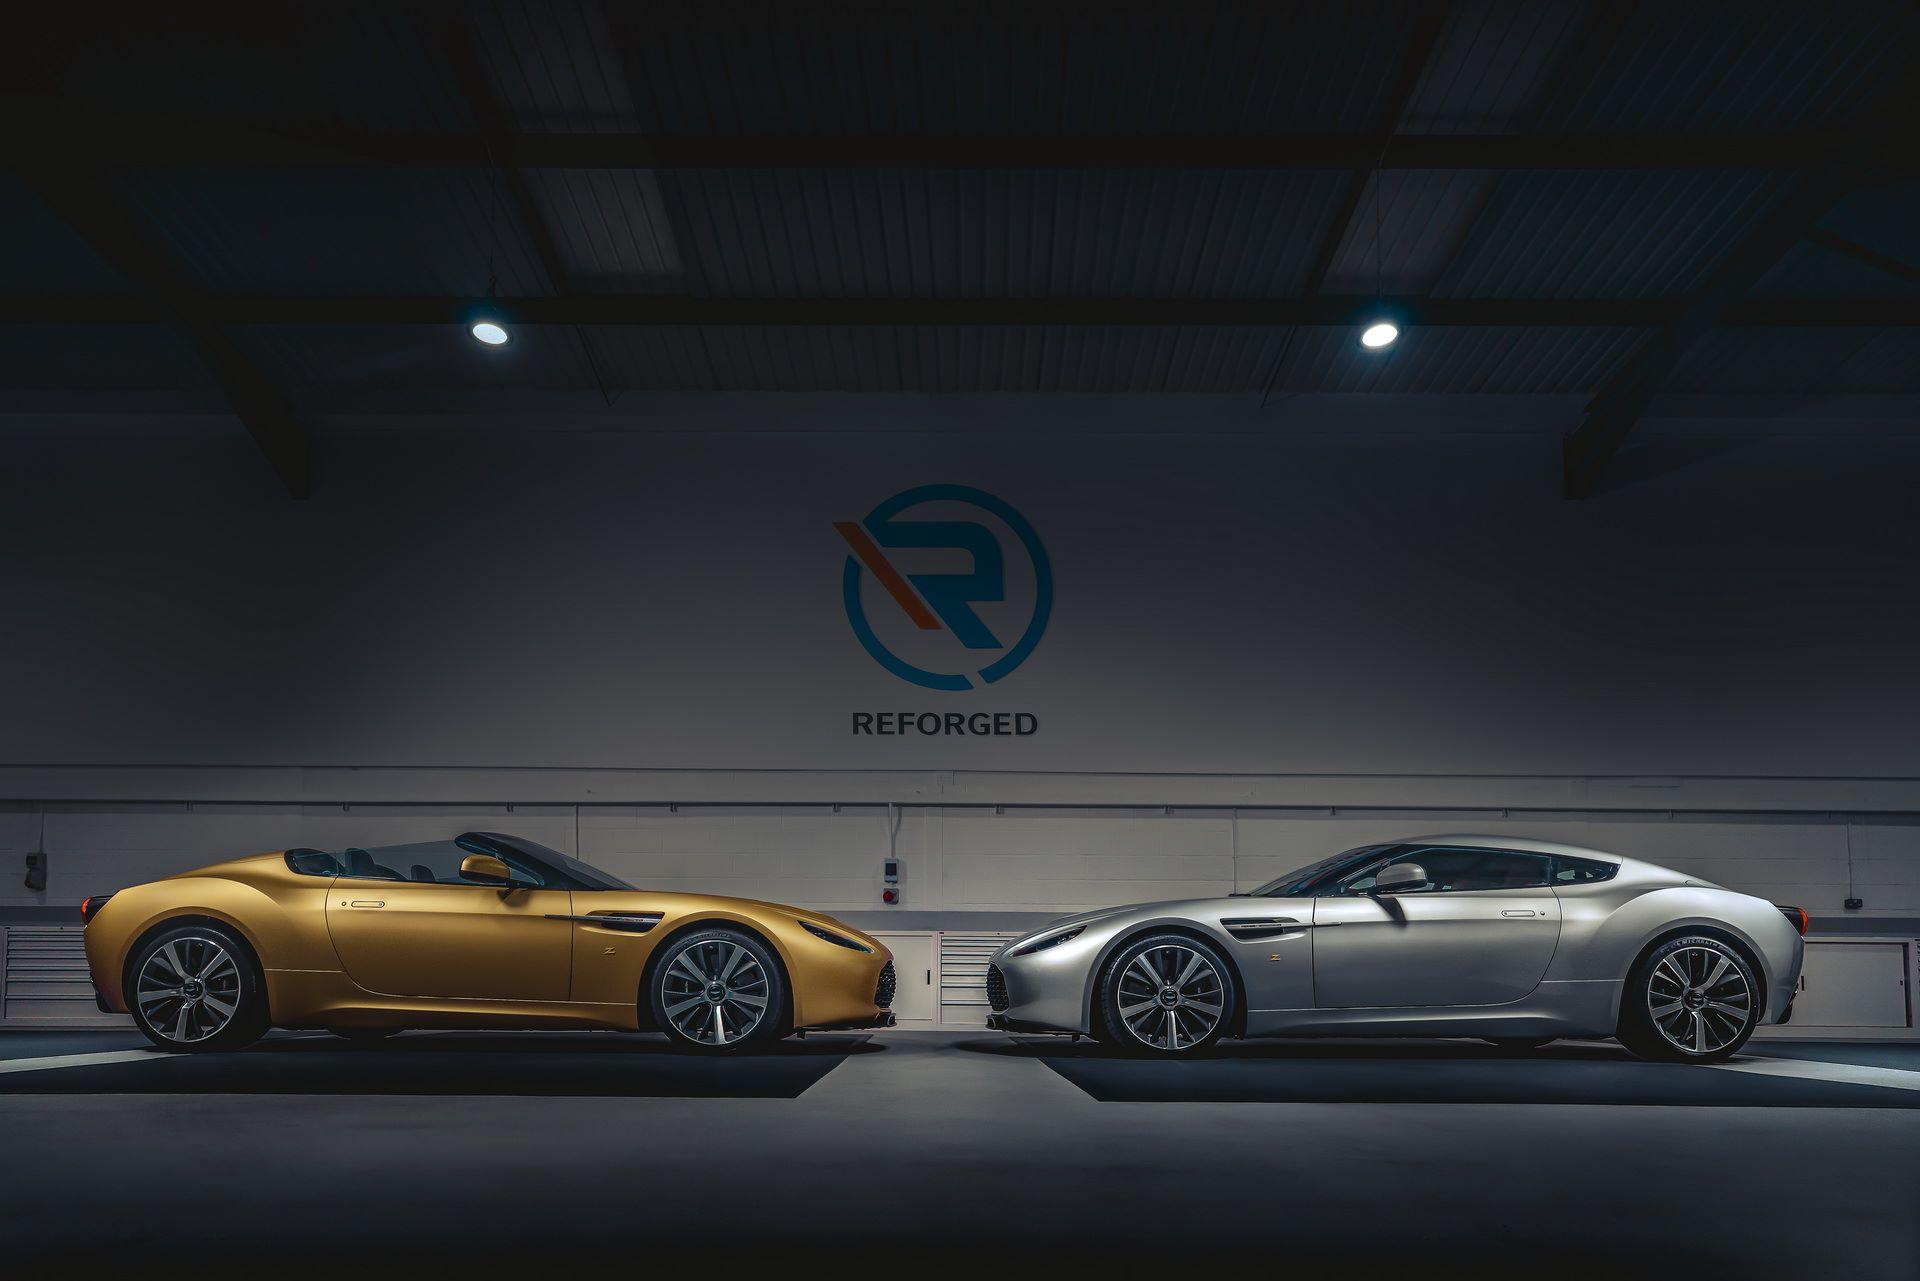 First-Aston-Martin-Vantage-V12-Zagato-Heritage-Twins-4